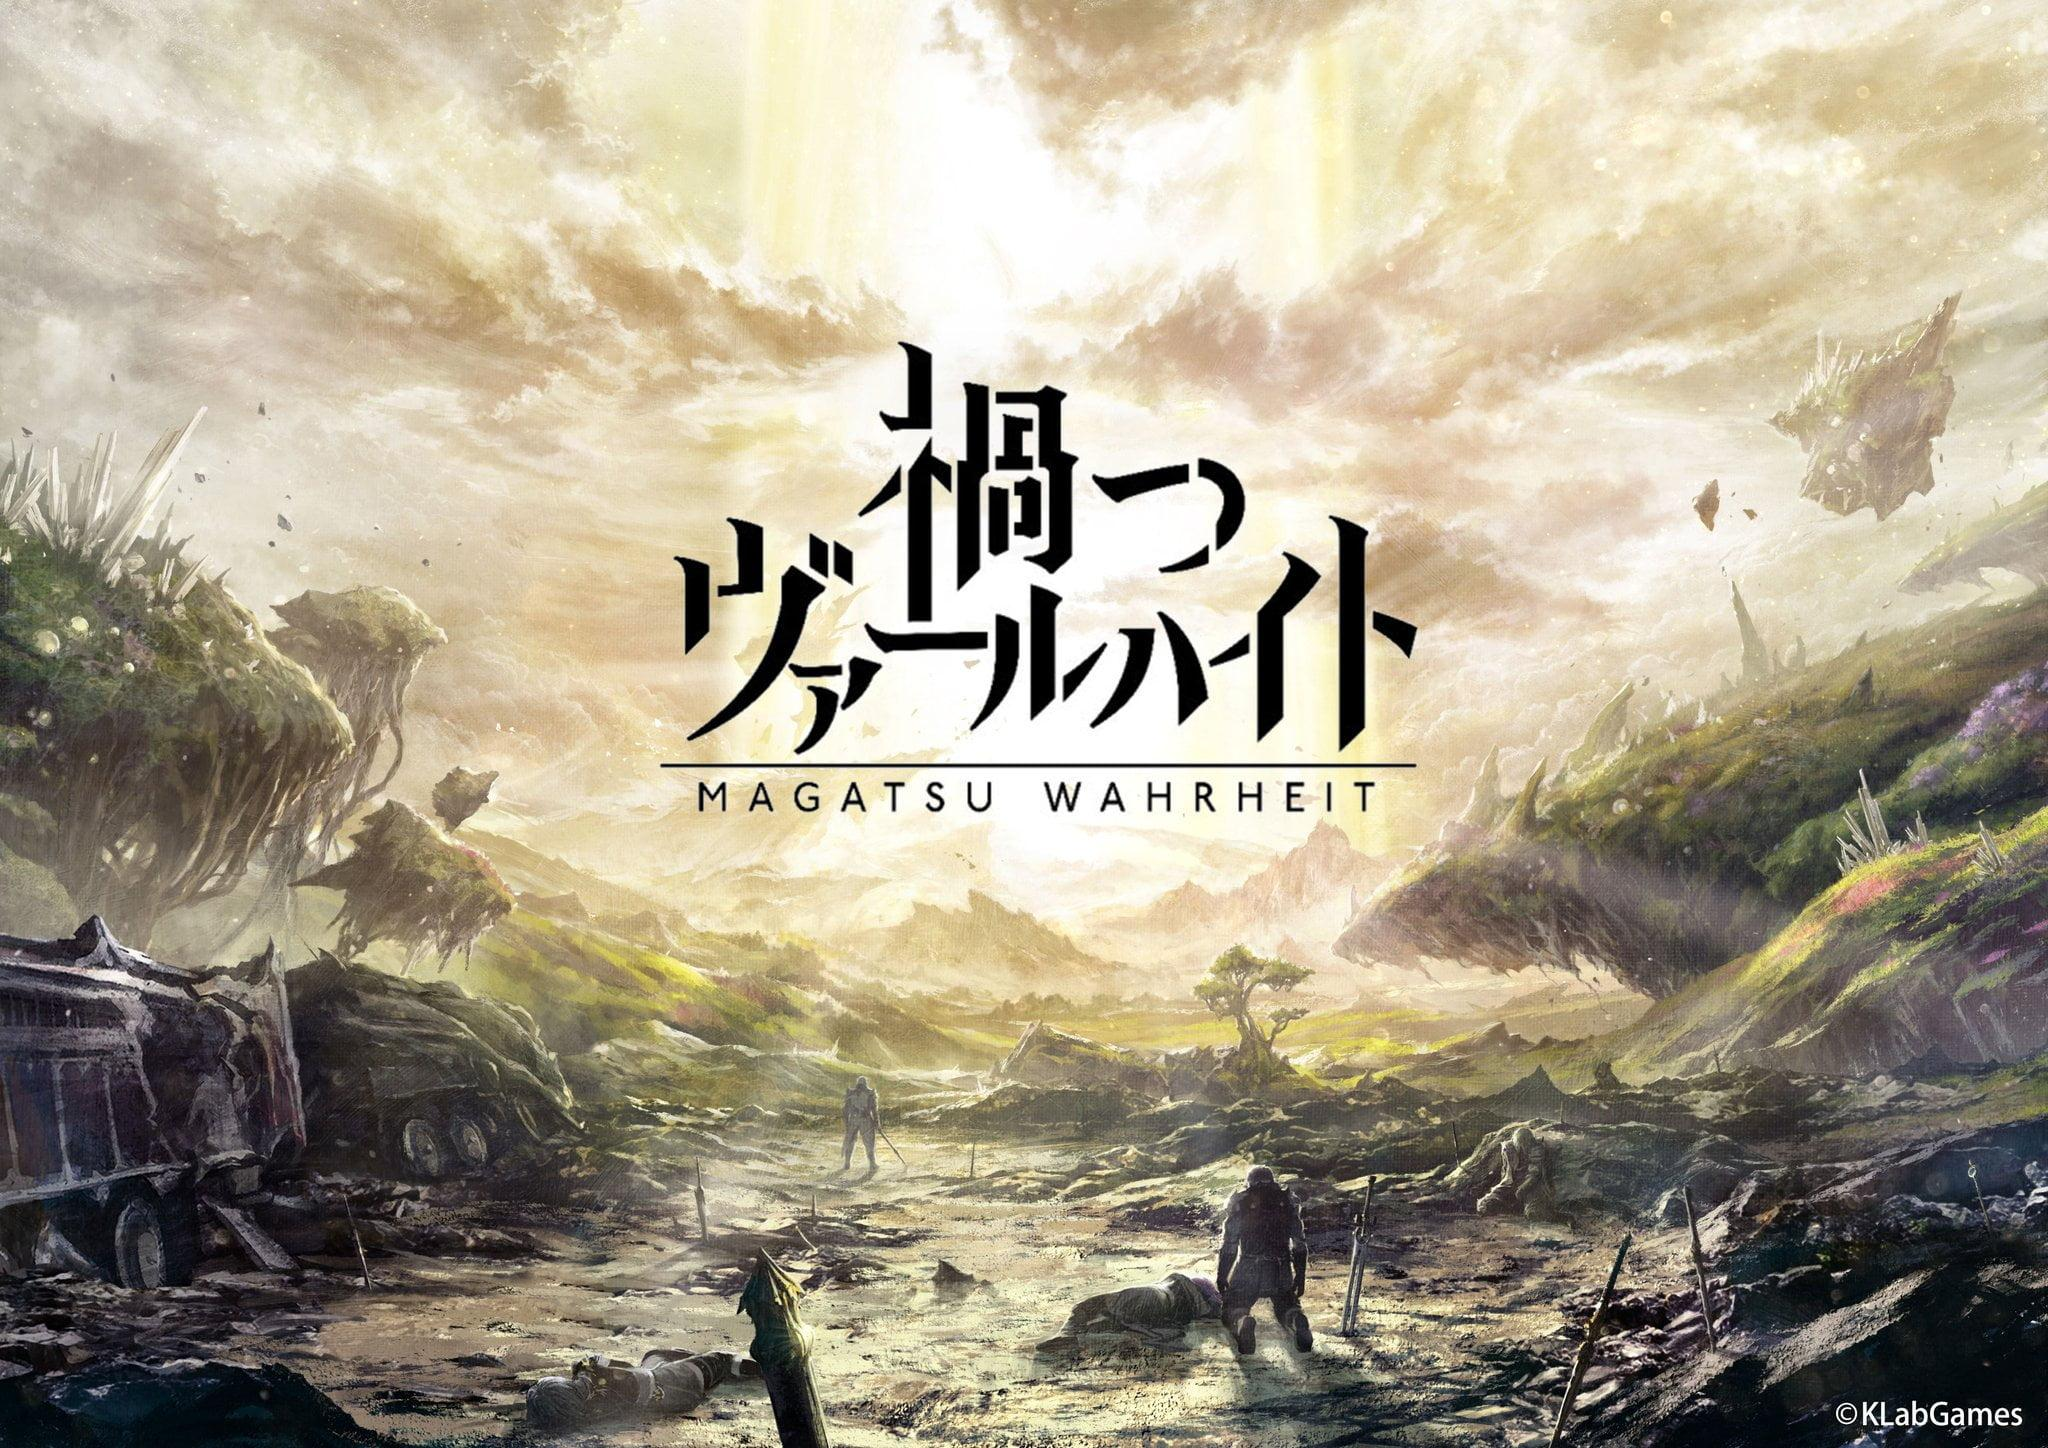 Magatsu-Wahrheit-TV-Anime